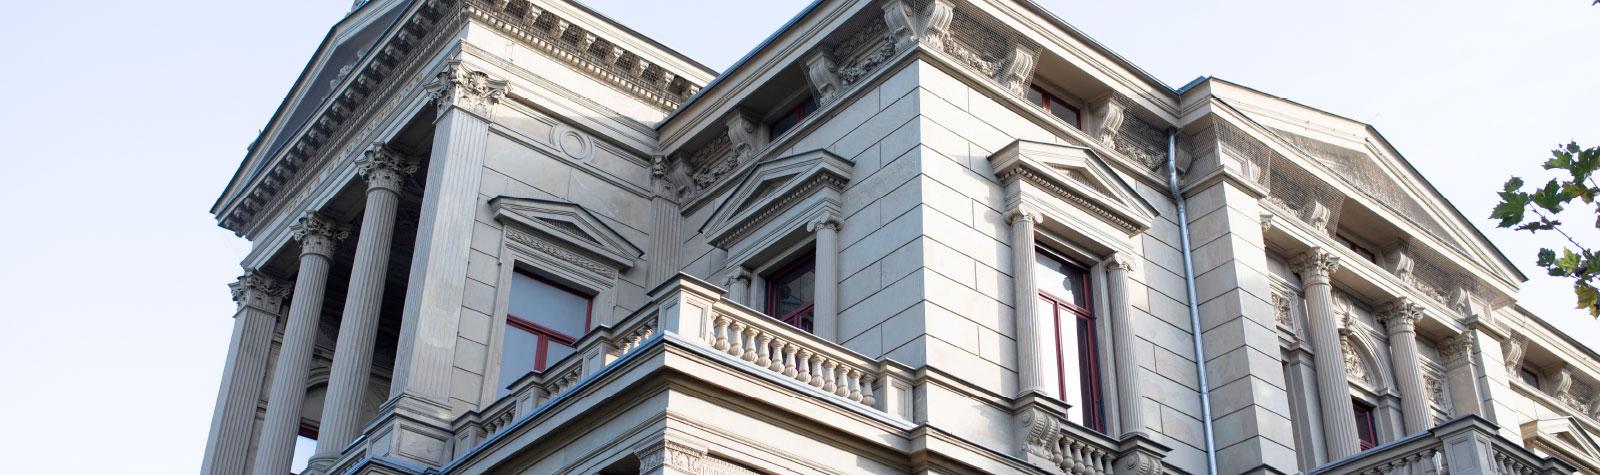 Förderverein Literaturhaus Wiesbaden